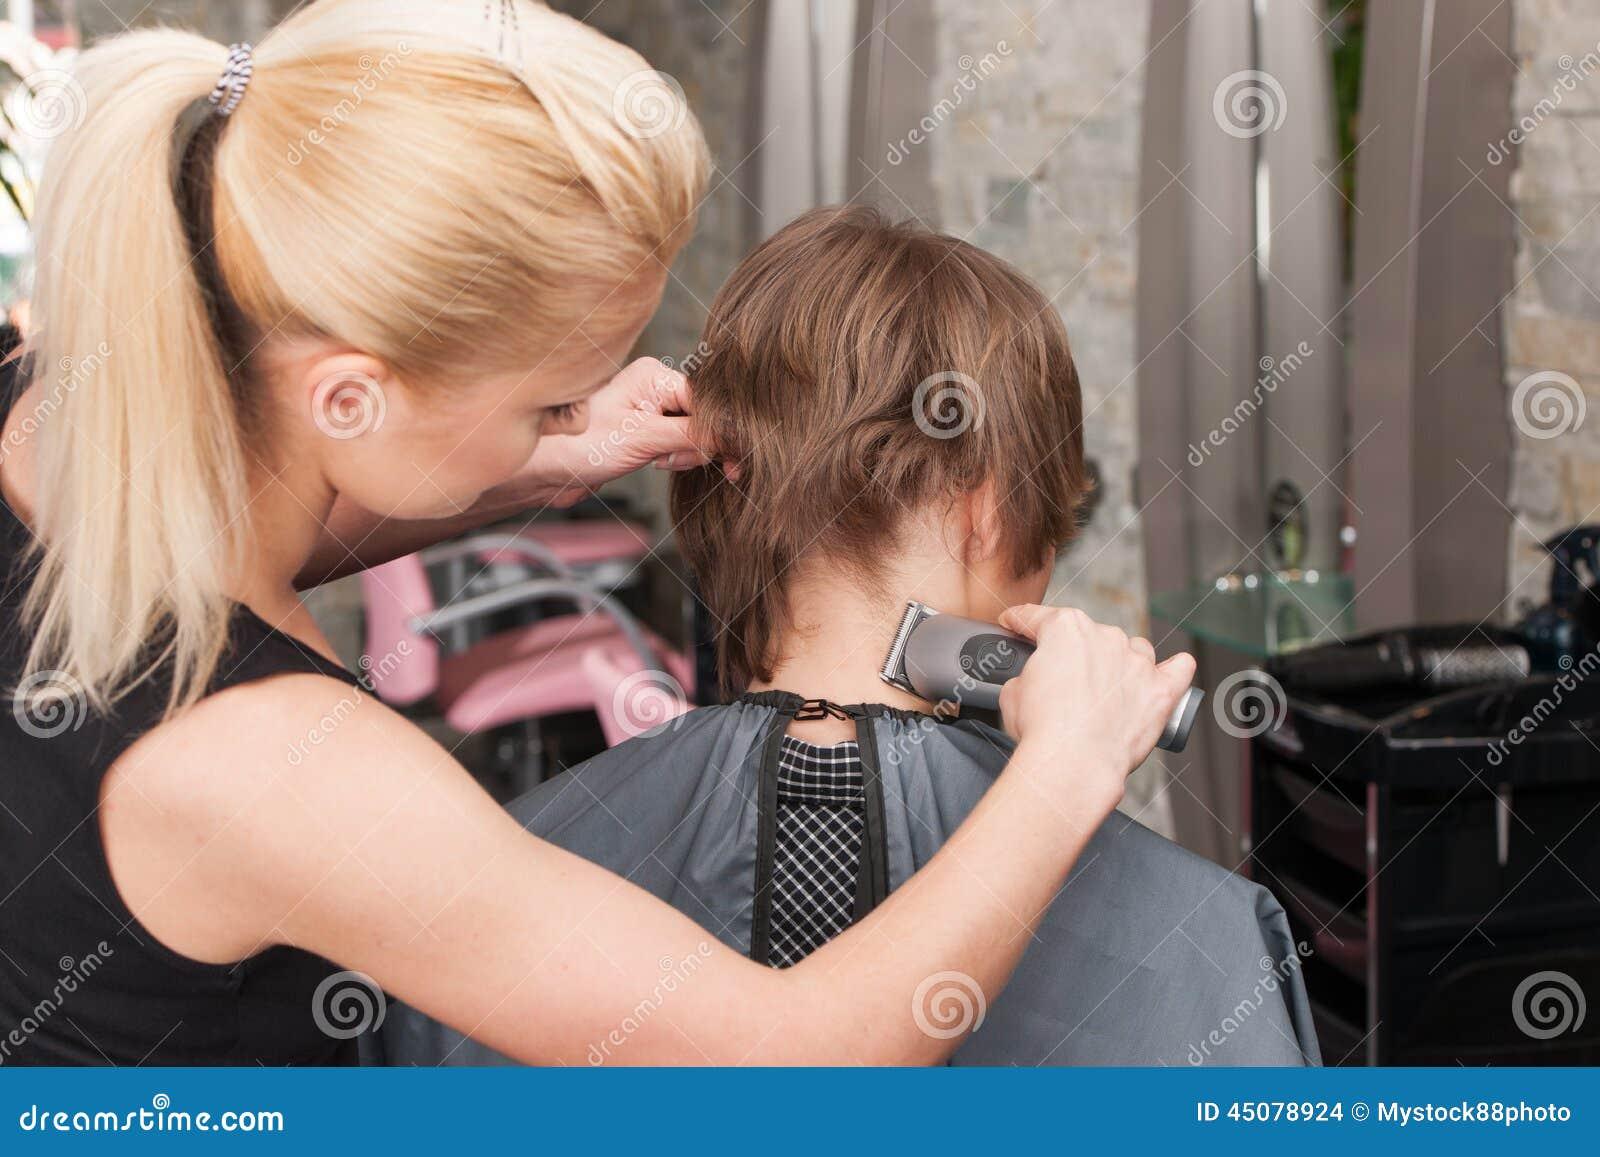 Female Hairdresser Cutting Hair Of Man Client Using